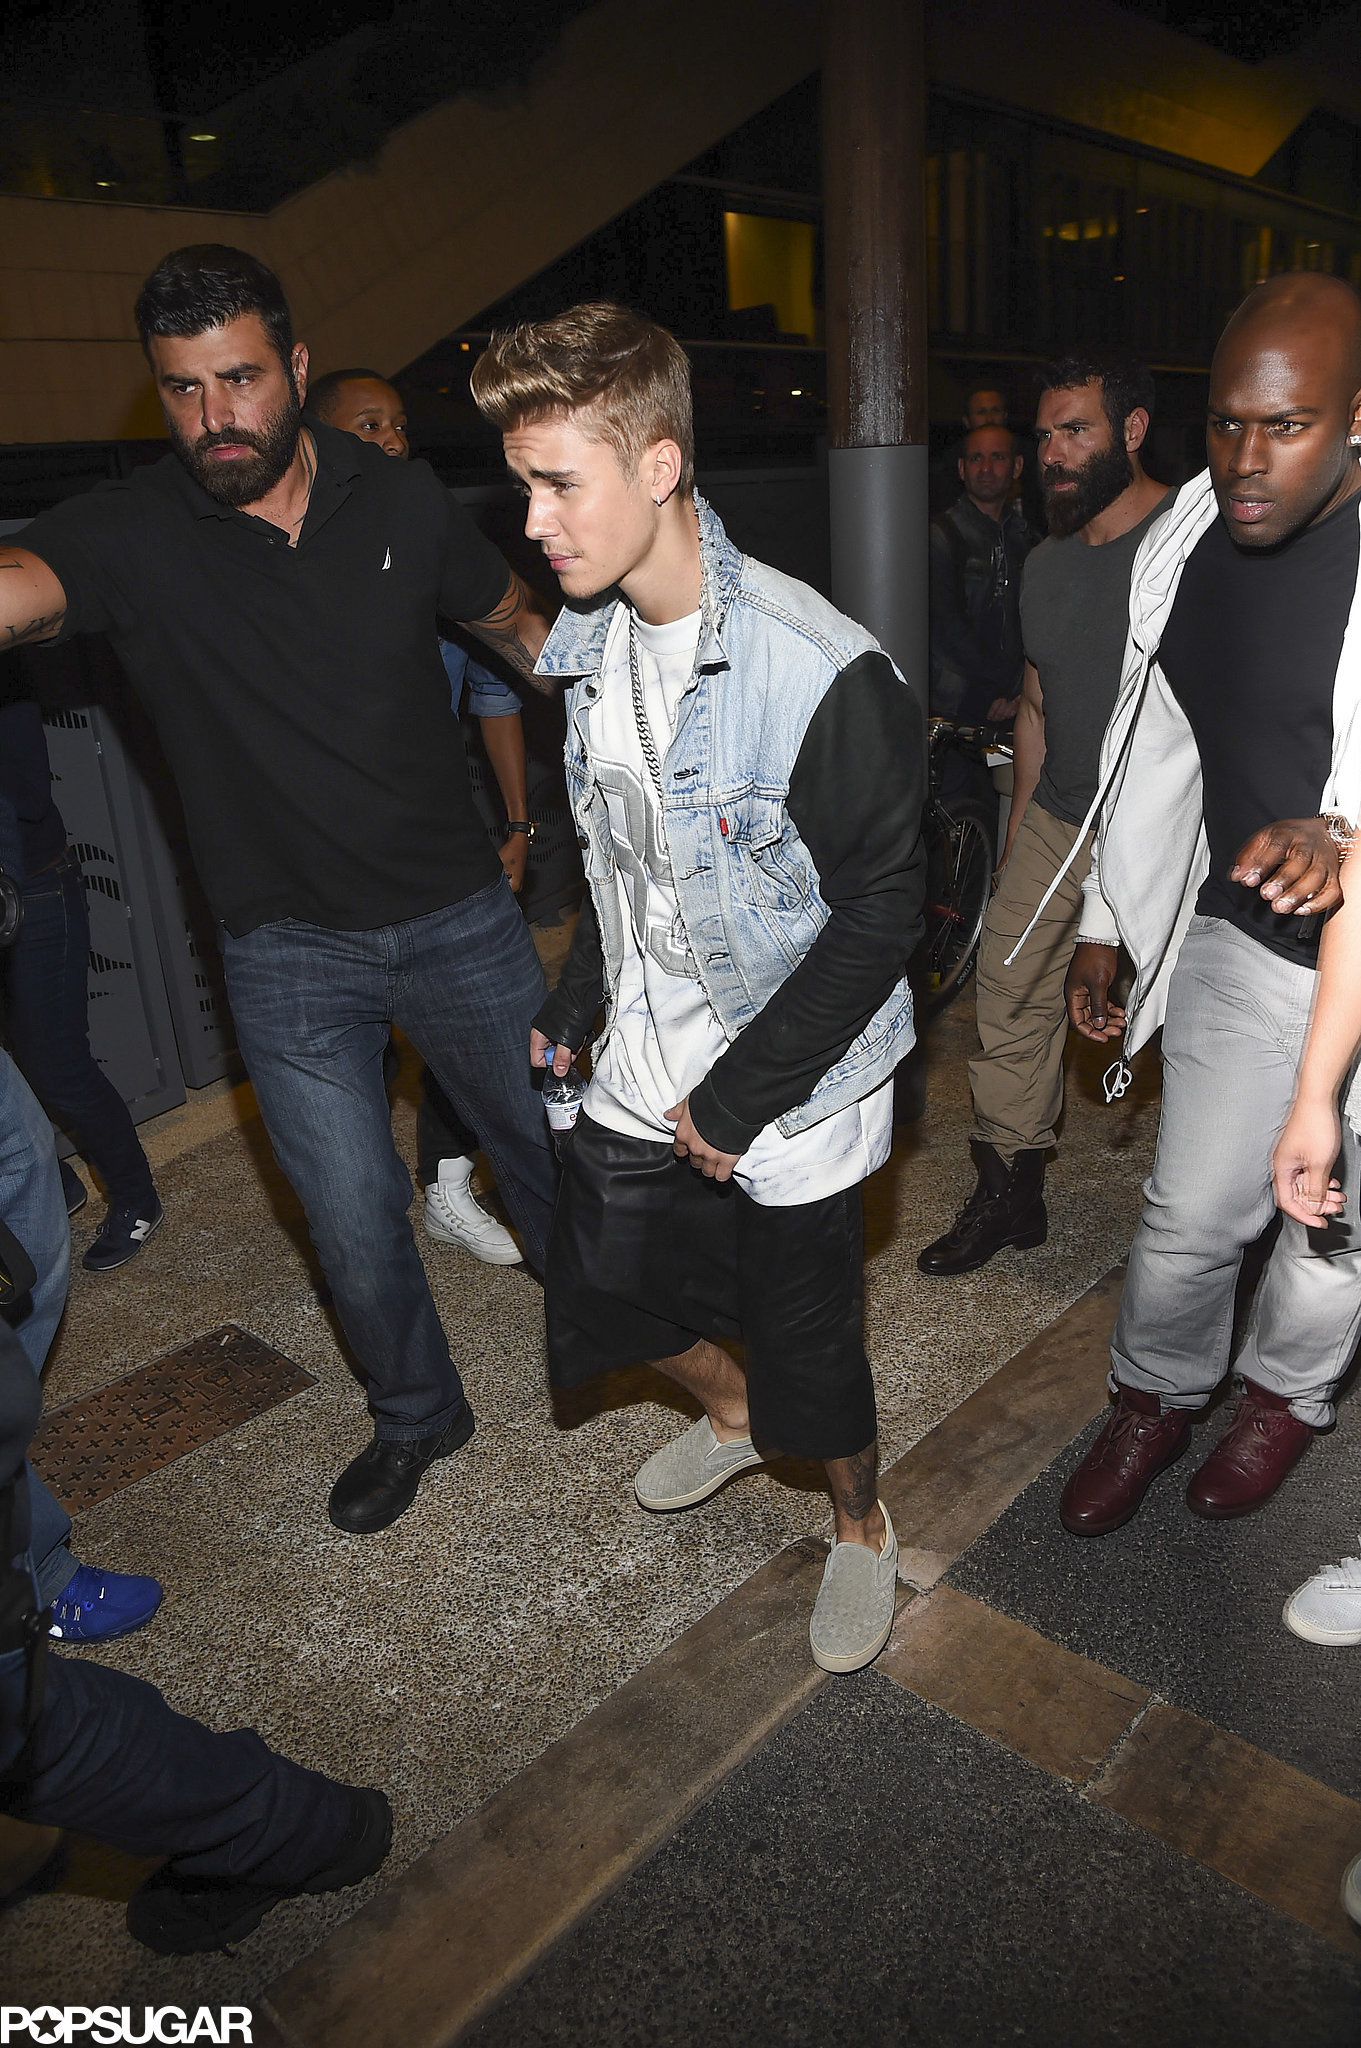 Justin Bieber Reignites Romance Rumors With a Victoria's Secret Model